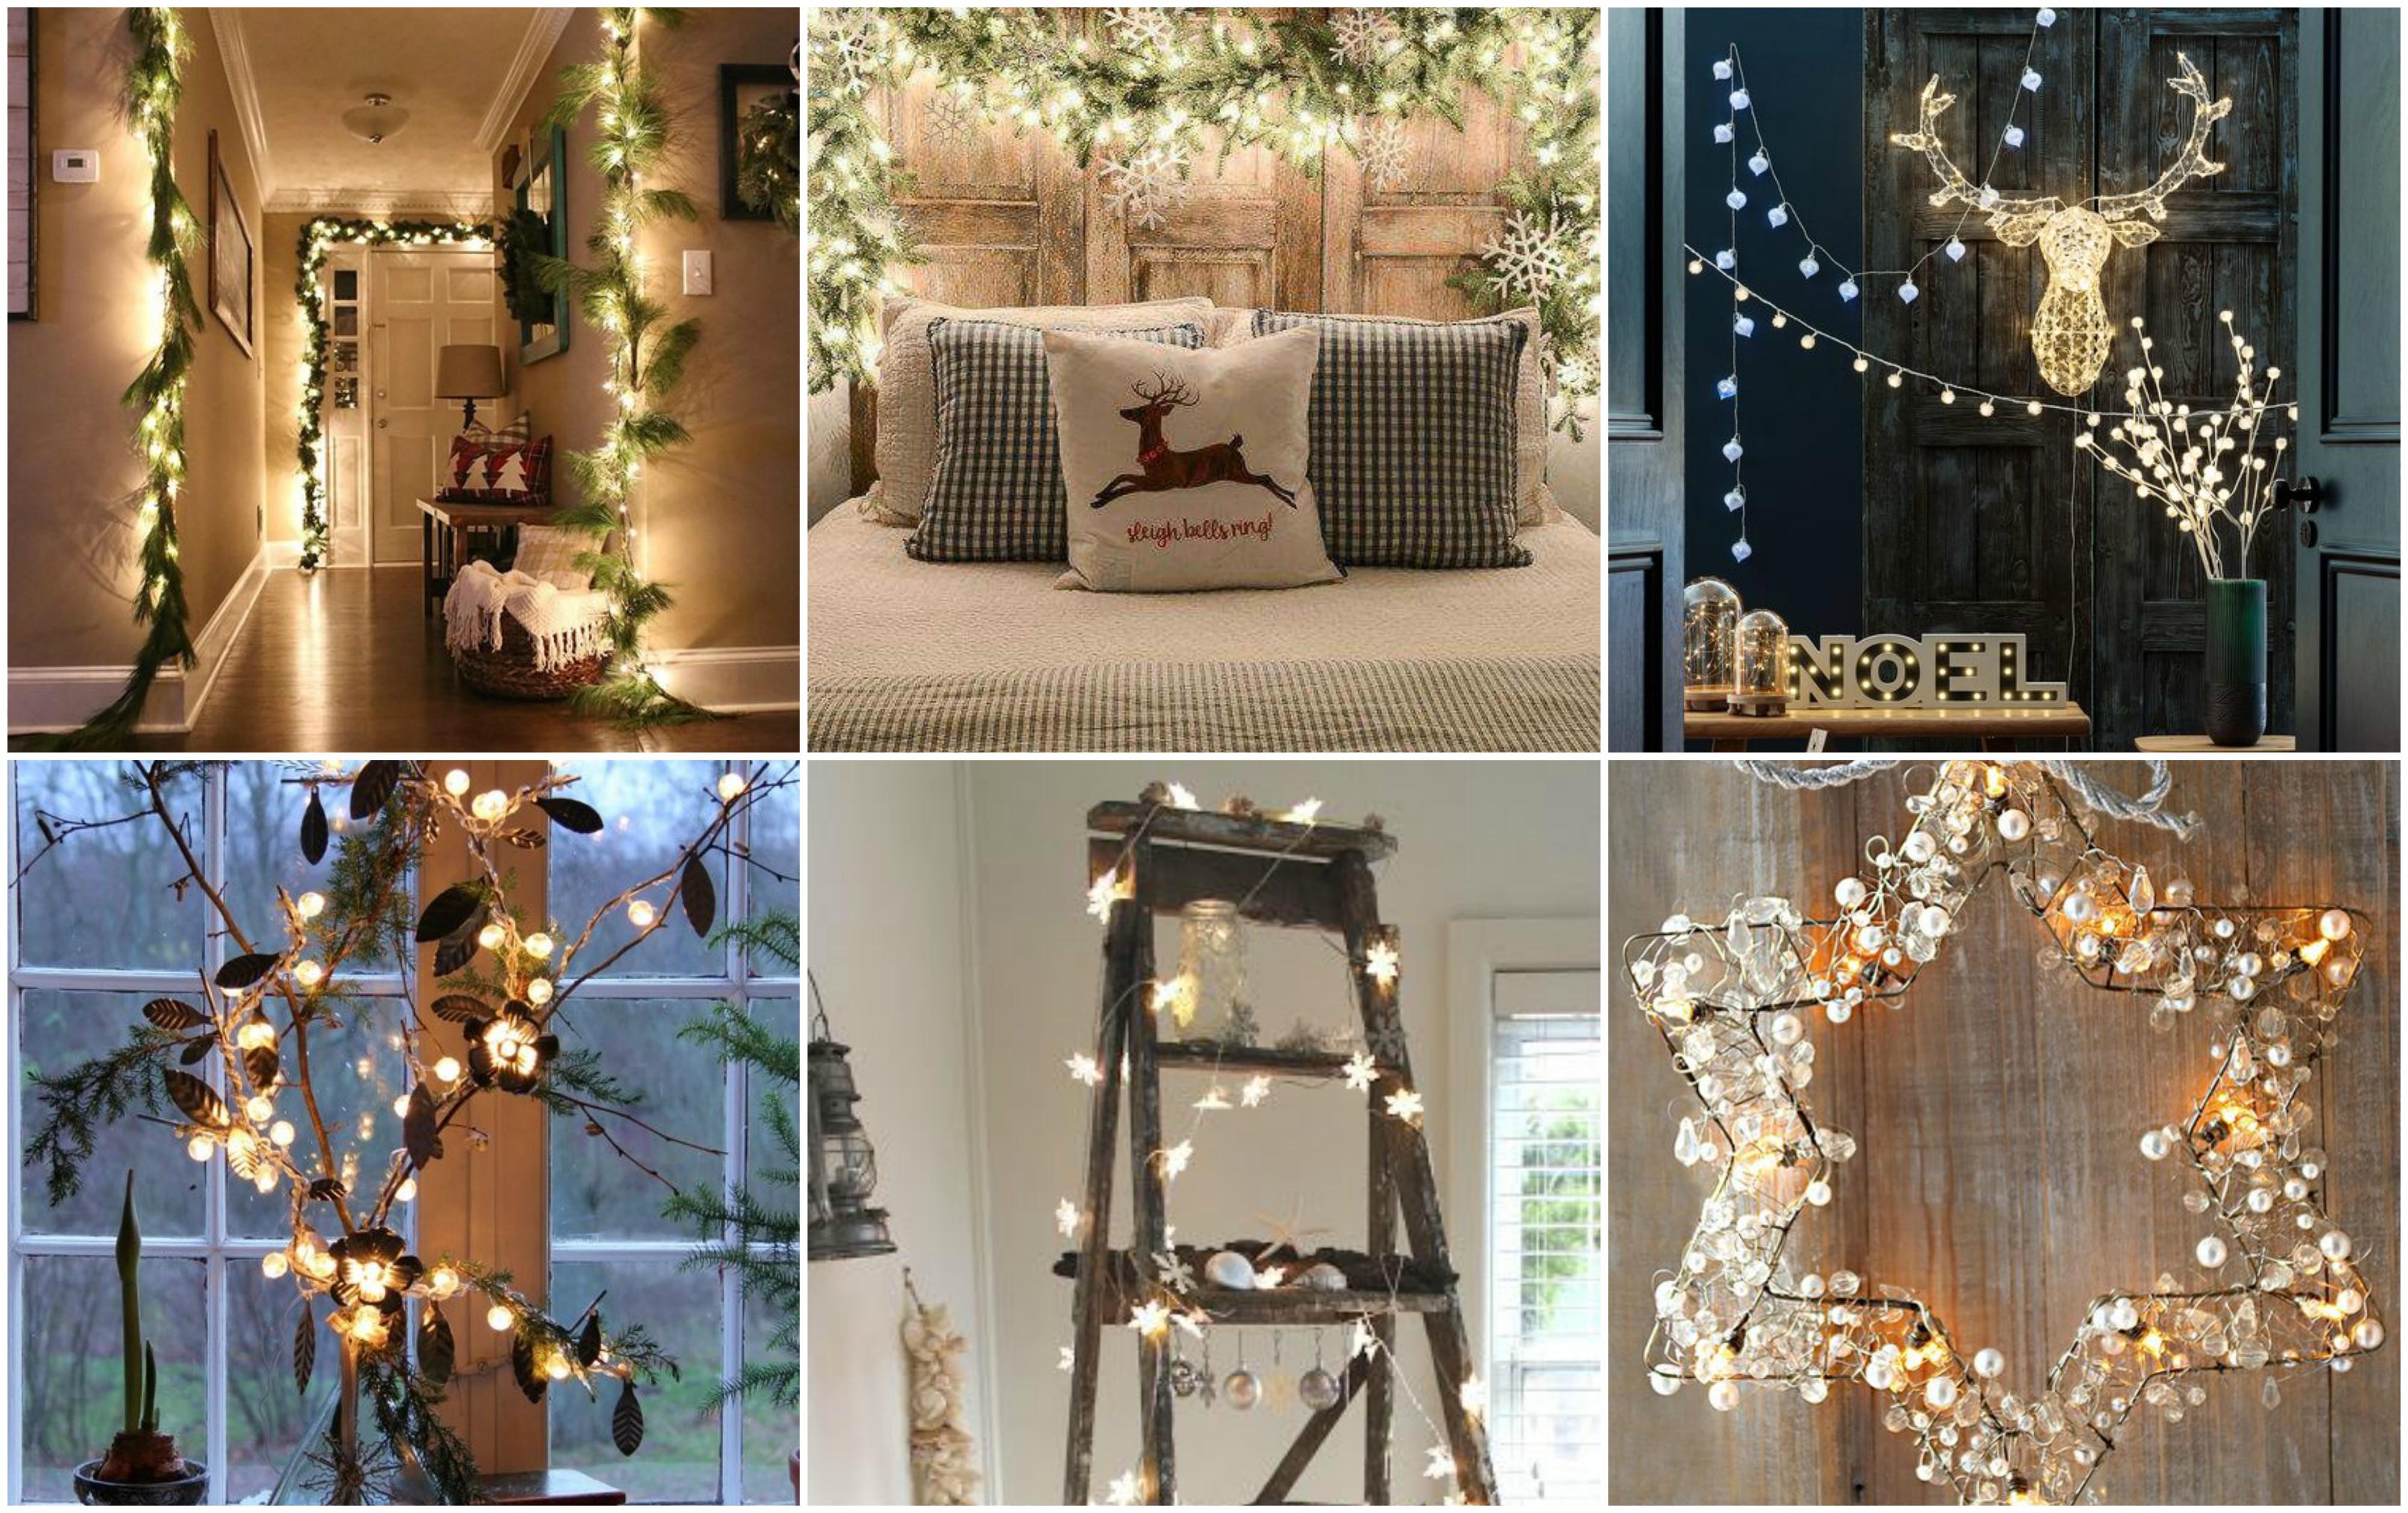 Bezaubernde weihnachtsbeleuchtung f r innen 30 ideen for Weihnachtslichterketten innen